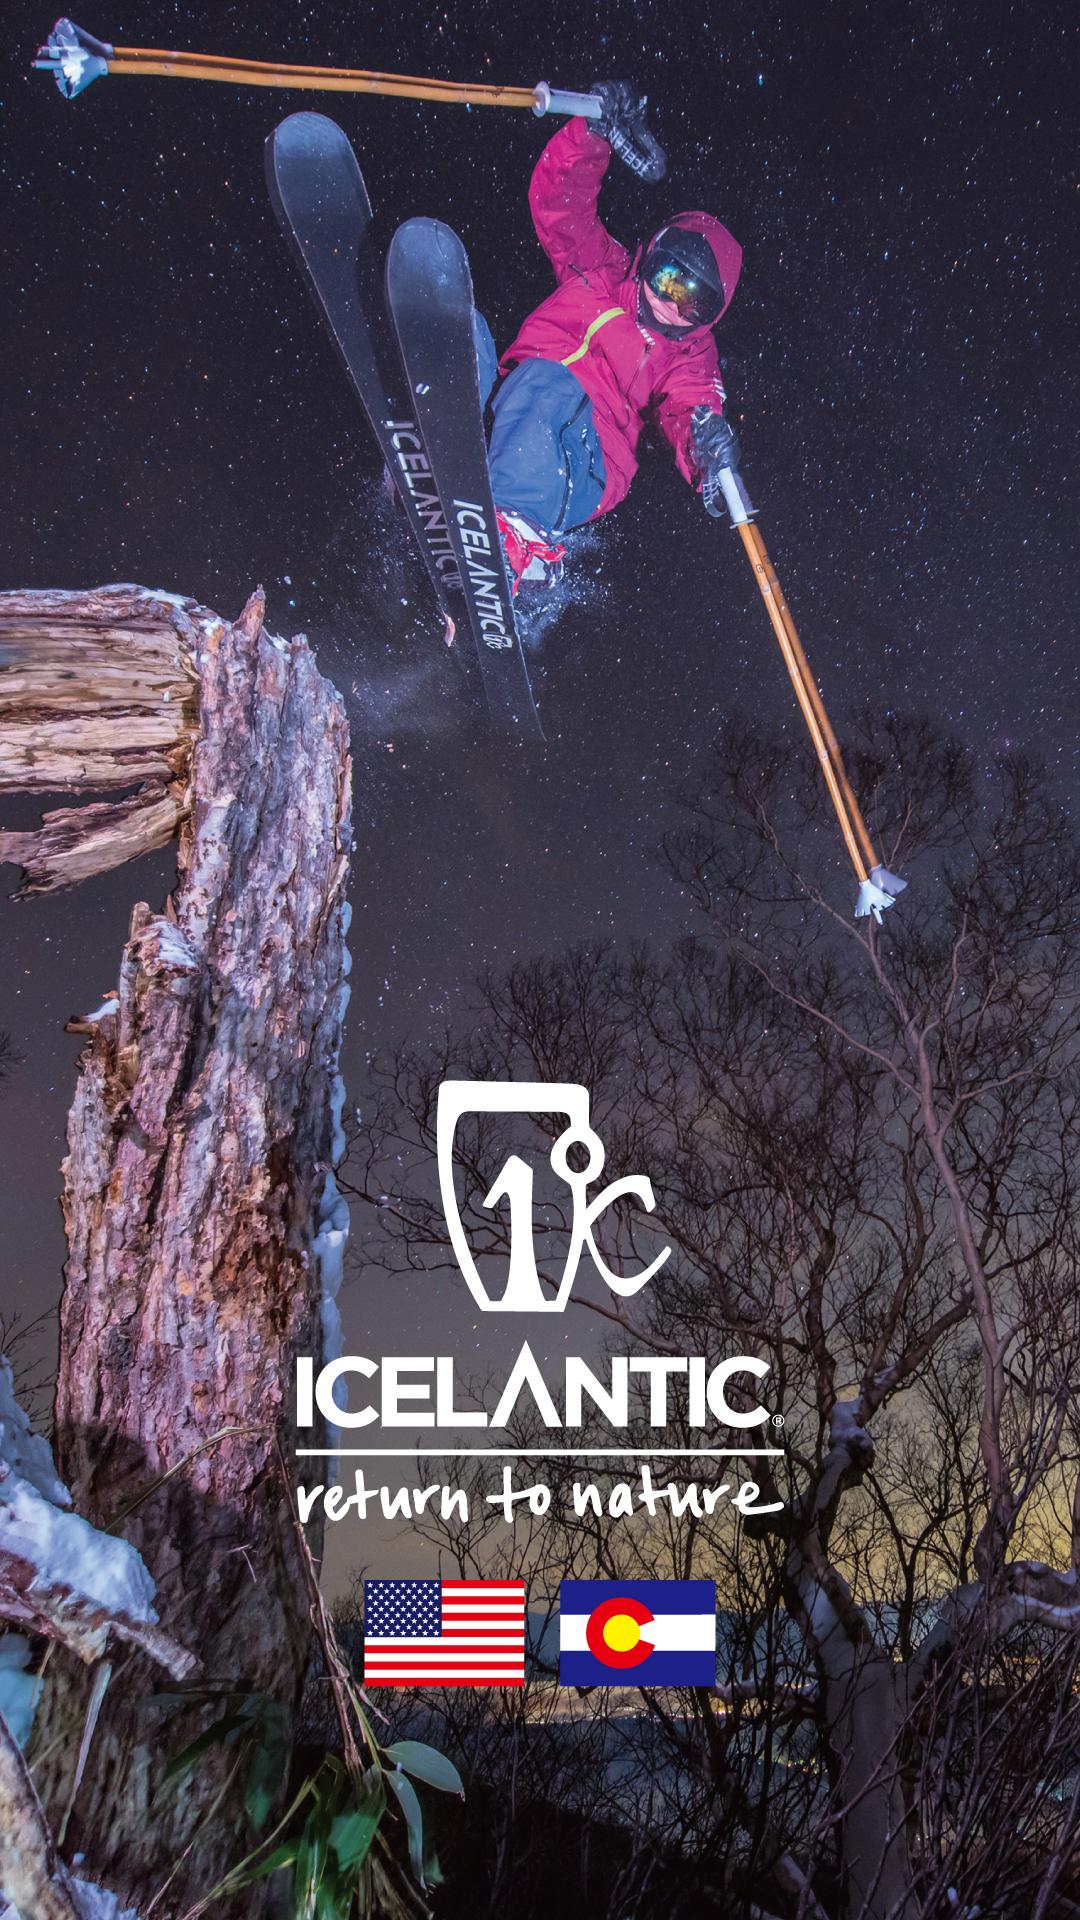 ICELANTICスマホ壁紙